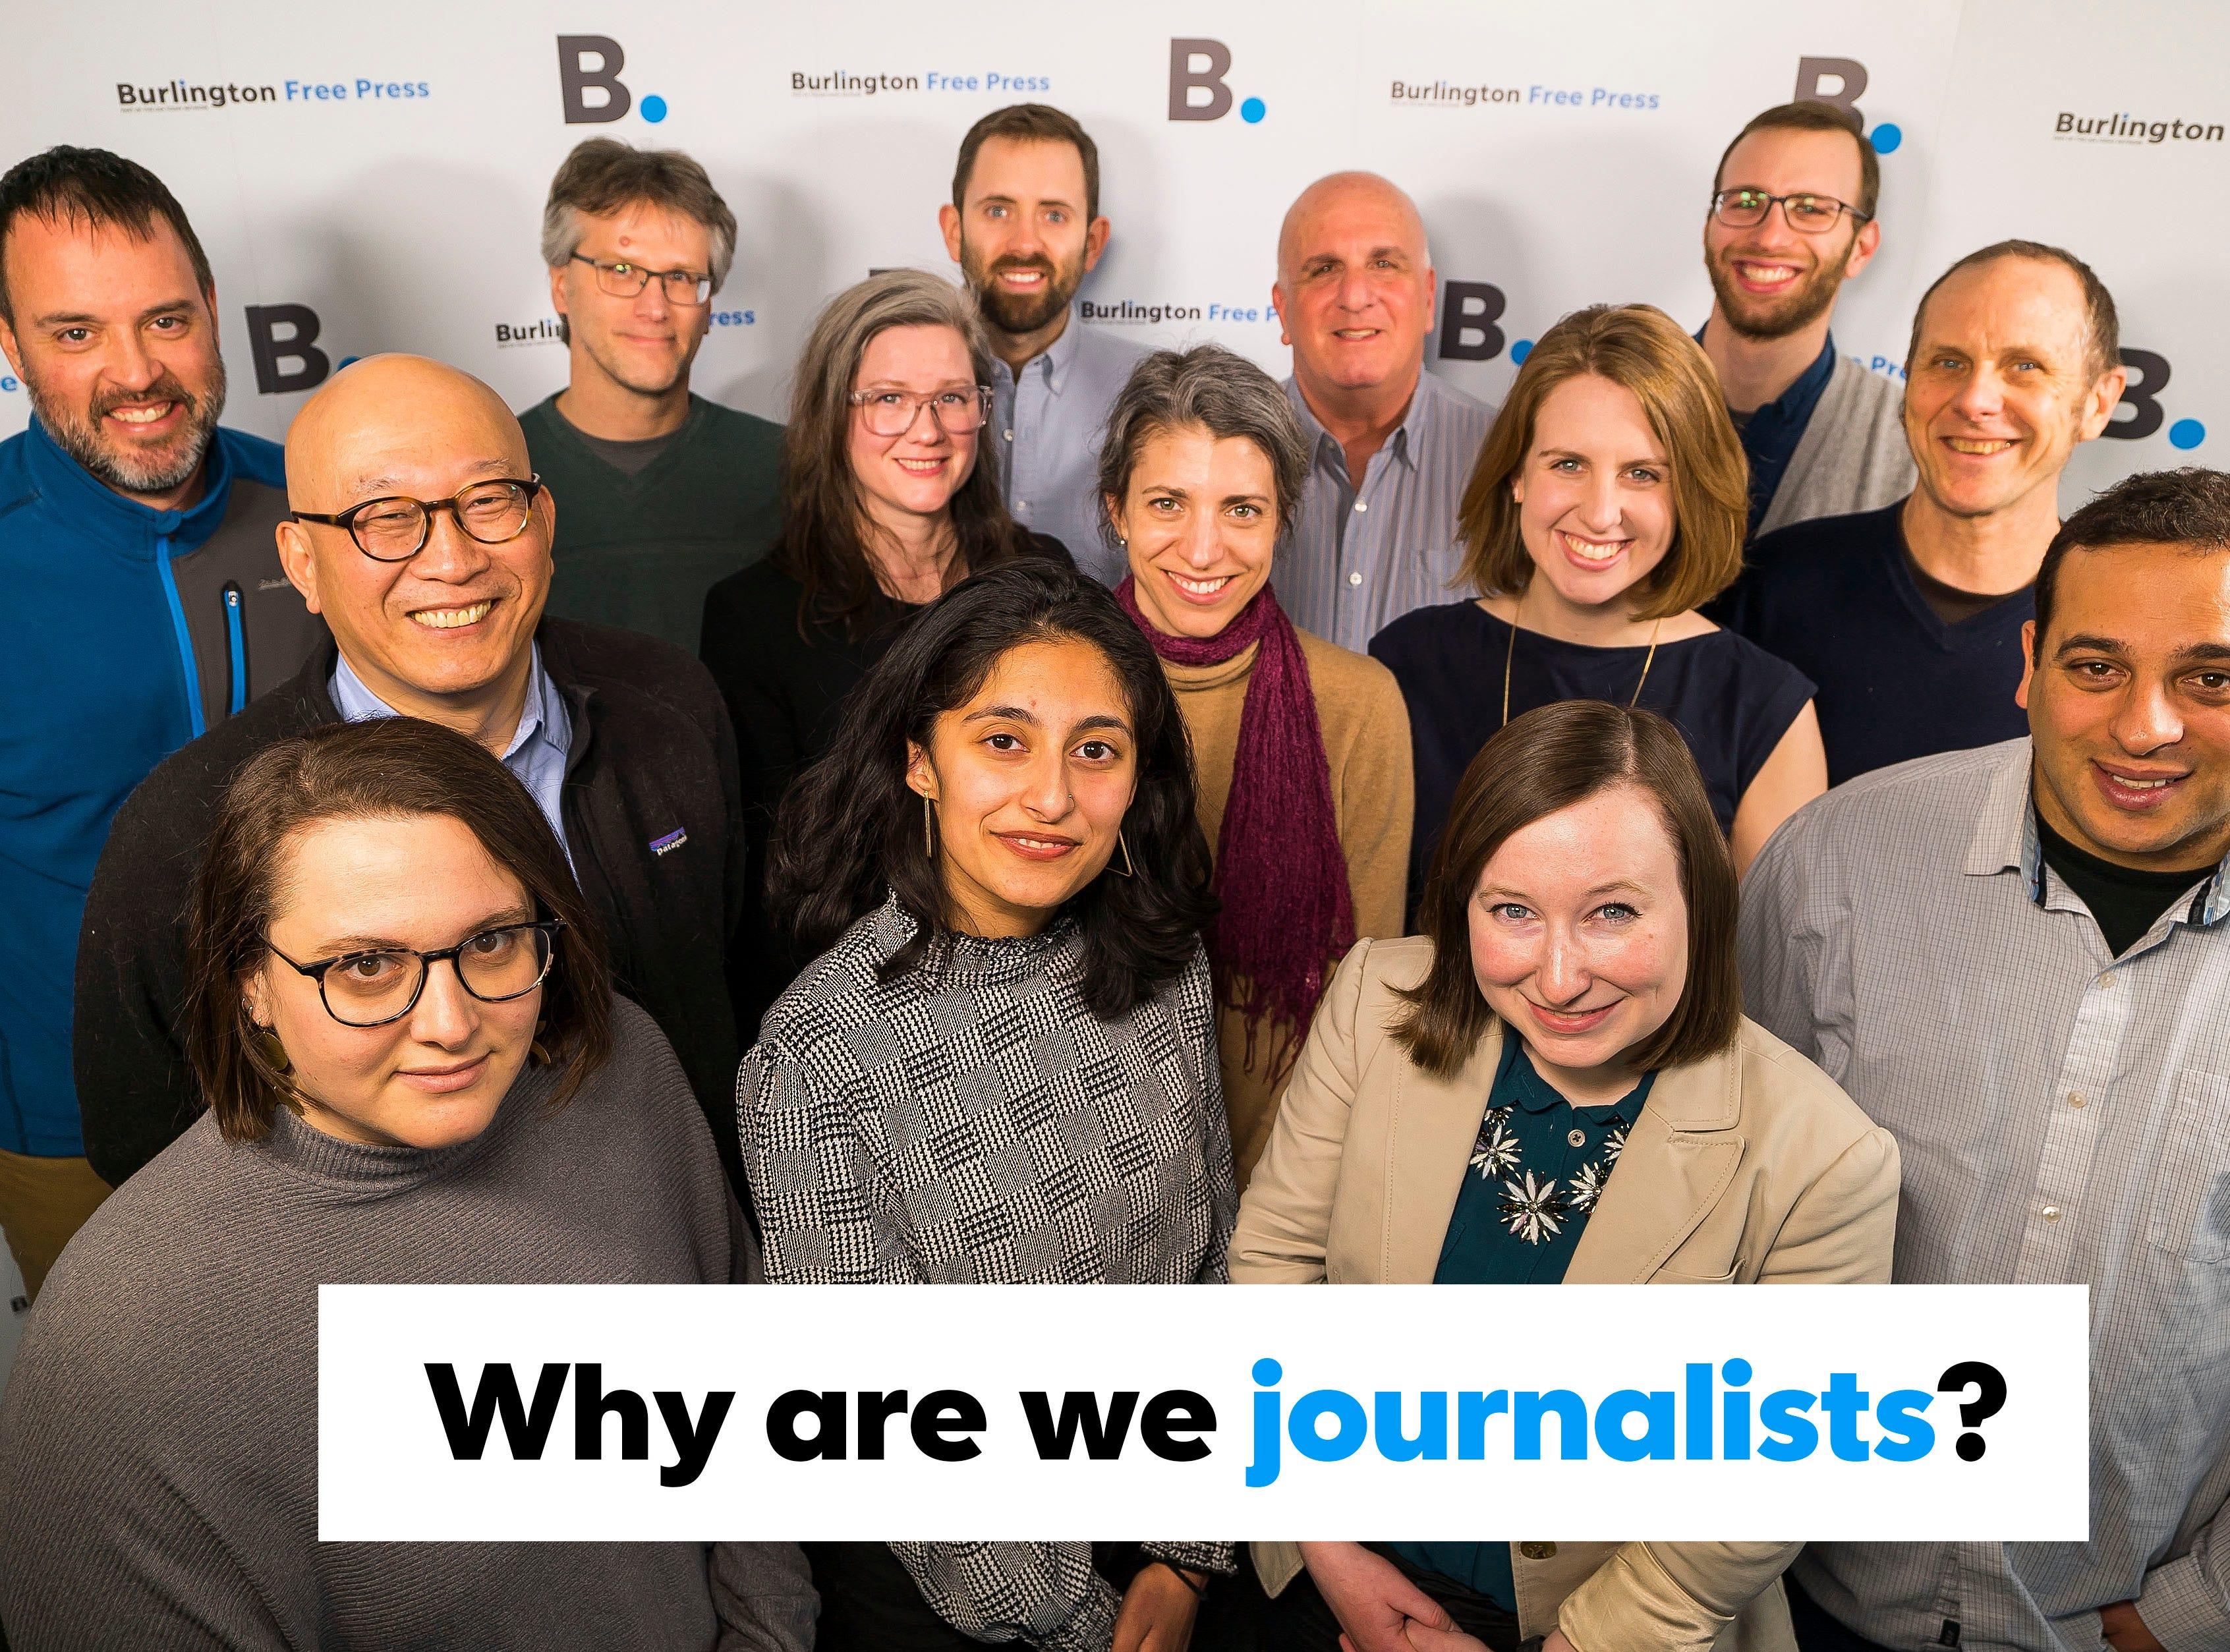 The Burlington Free Press news staff.